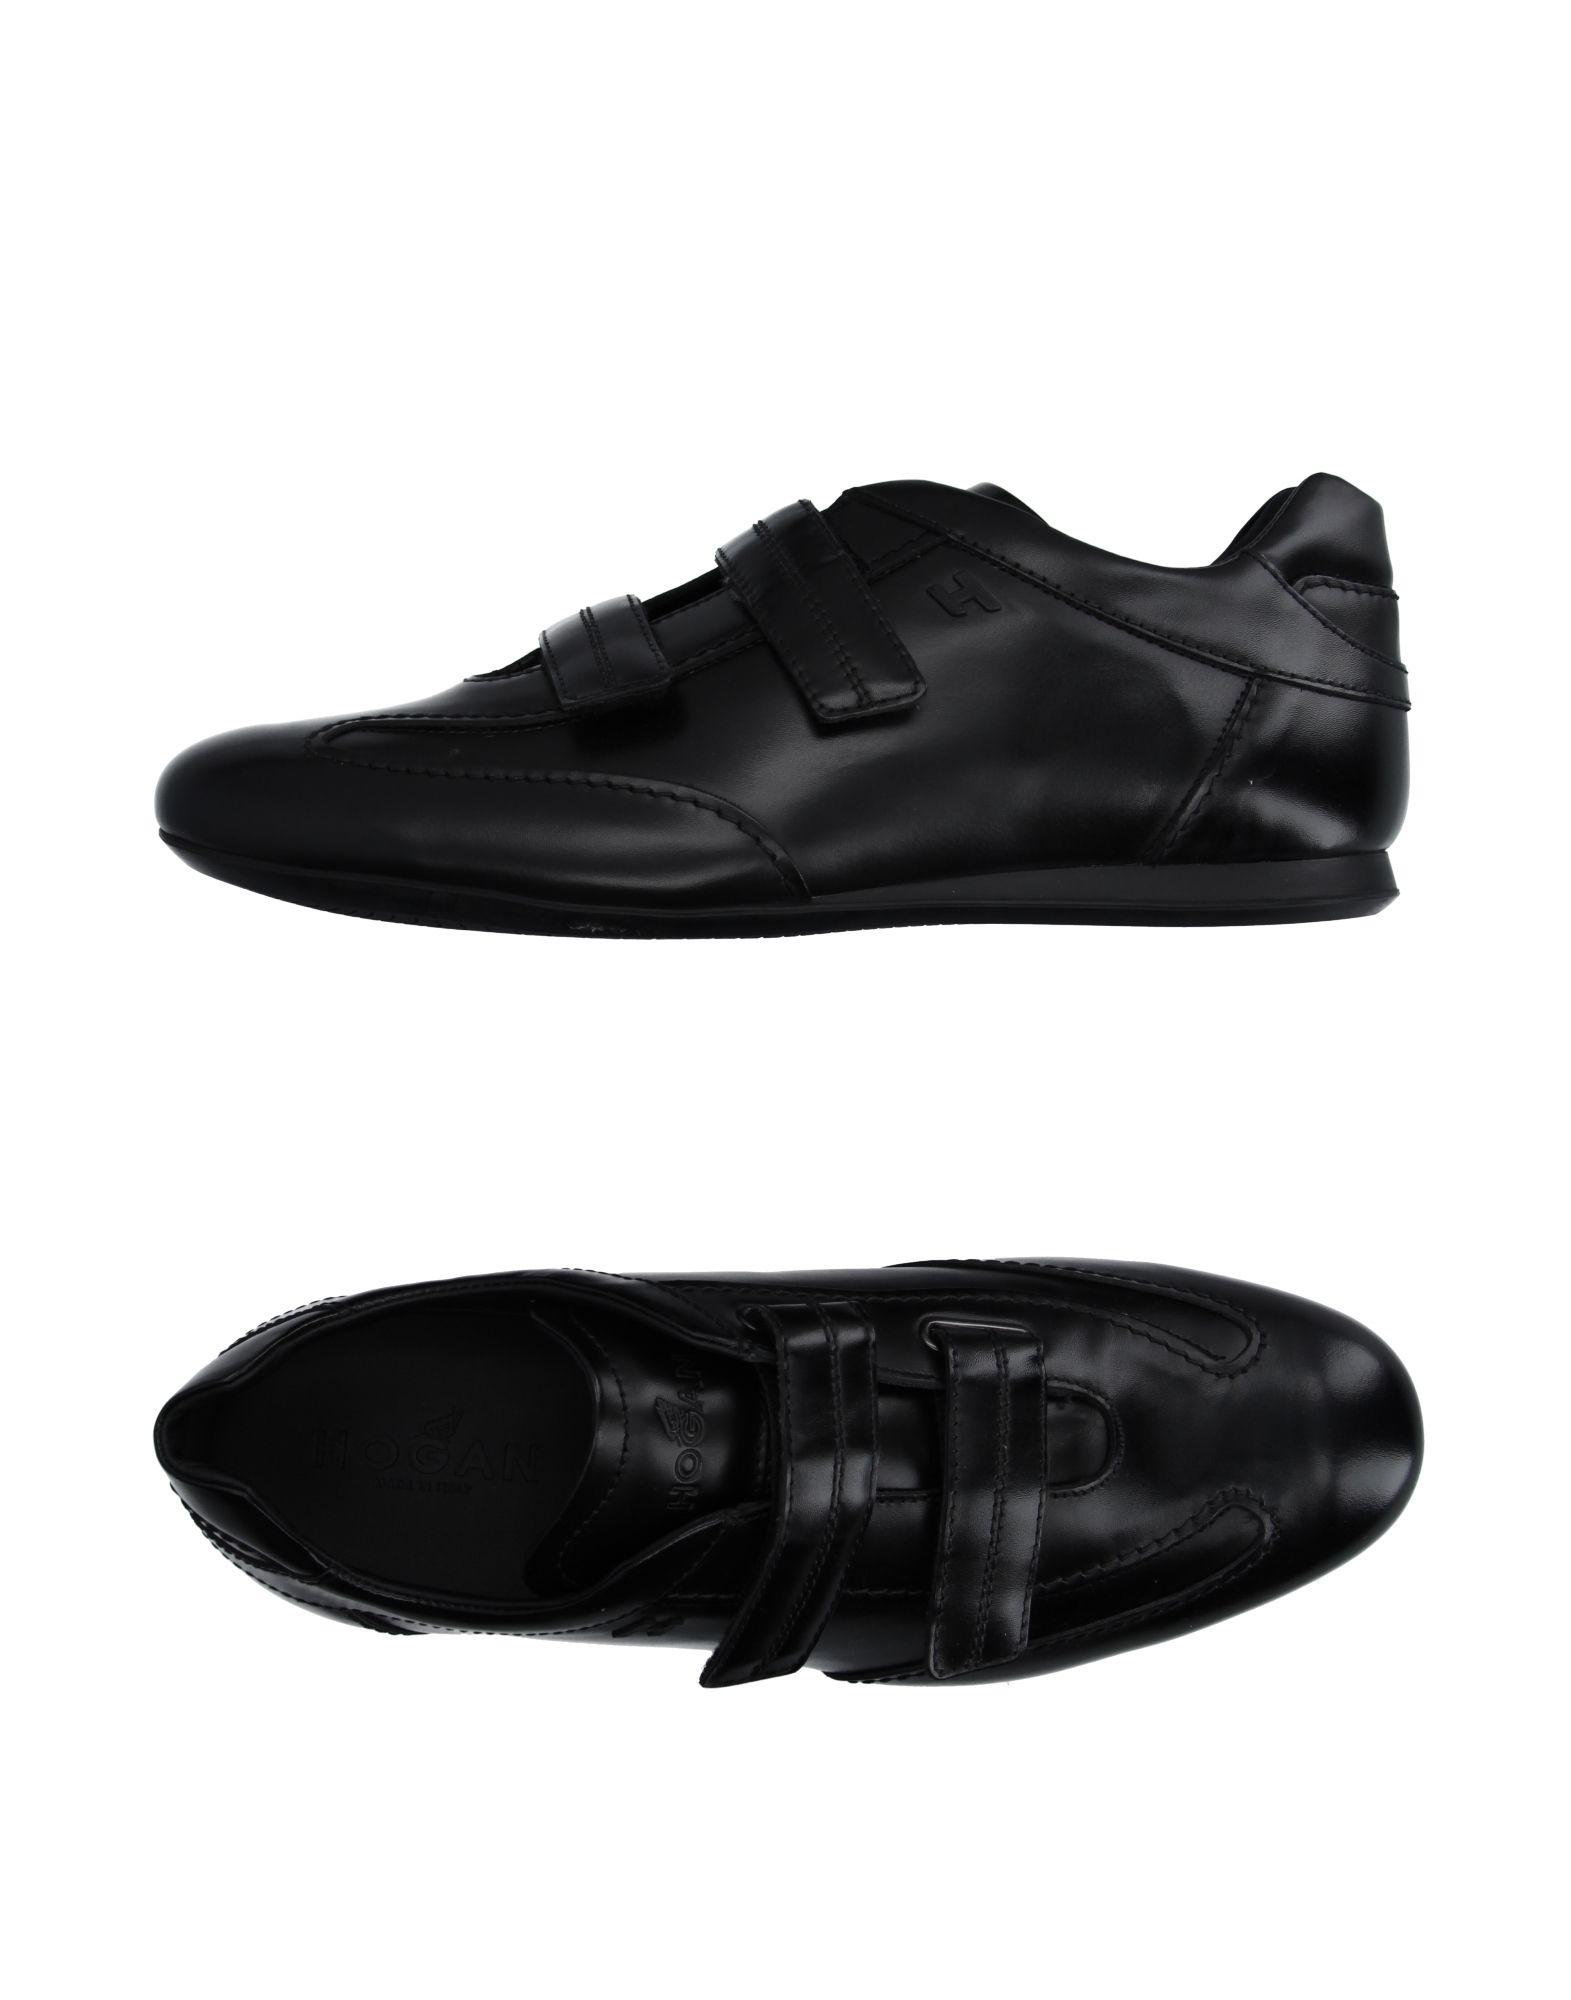 Hogan Sneakers Herren  11088117LG Gute Qualität beliebte Schuhe